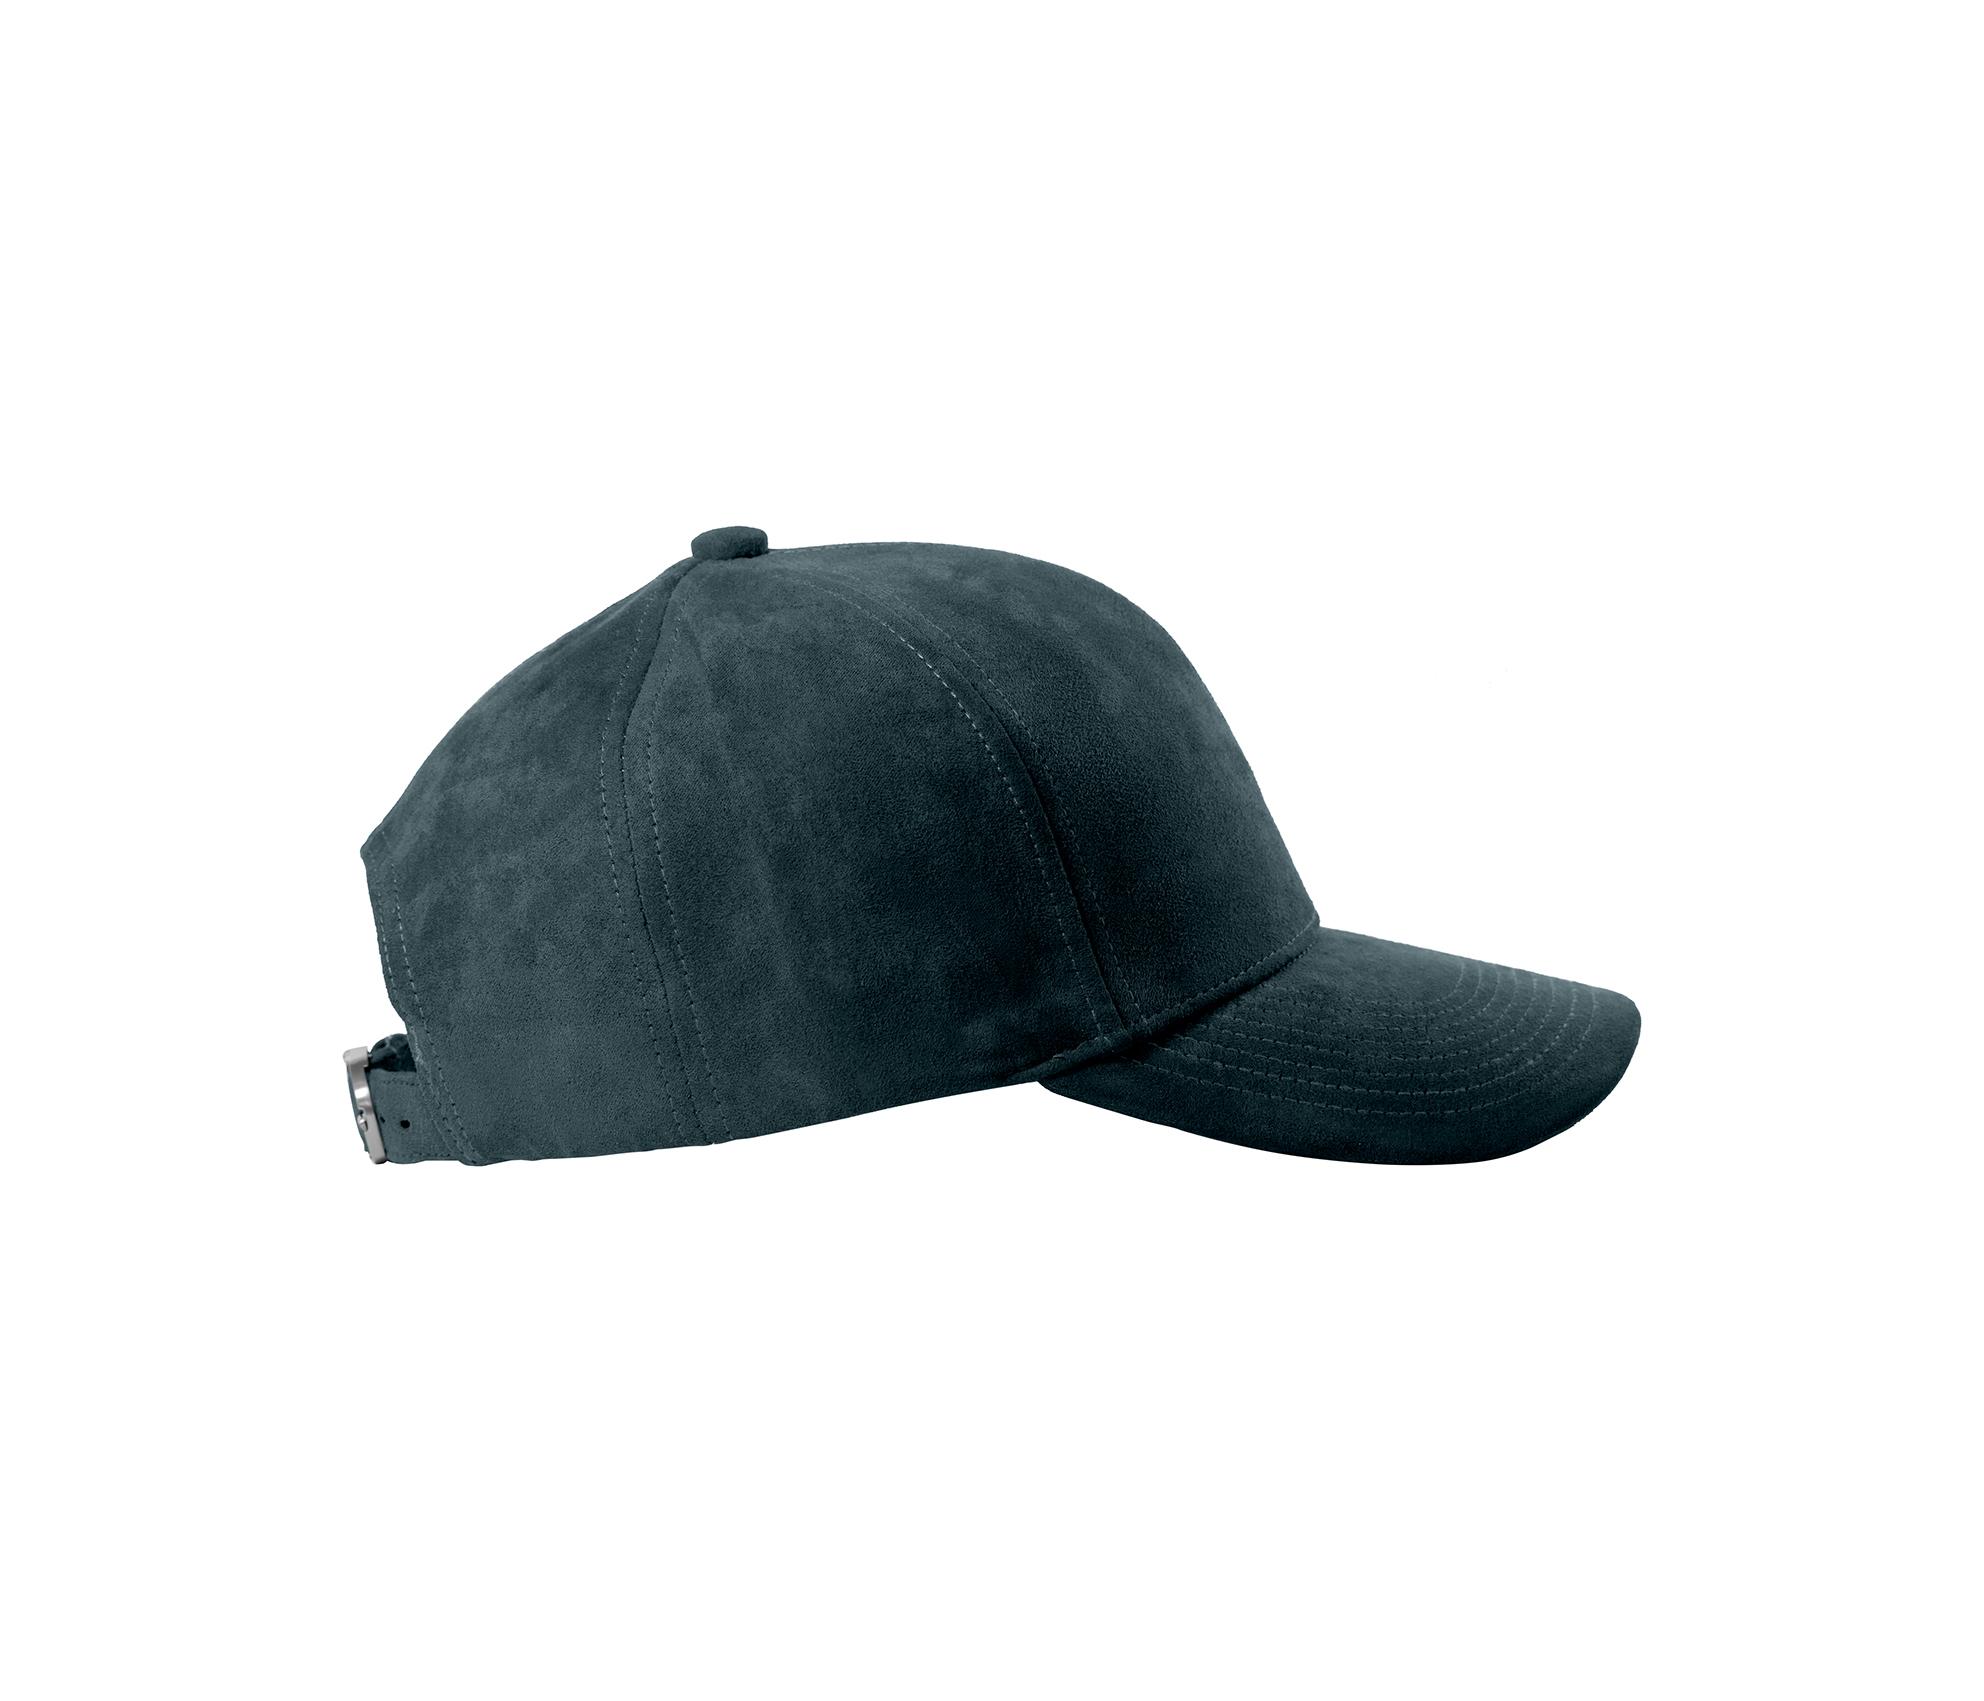 BASEBALL CAP PETROL GREEN SILVER SUEDE SIDE